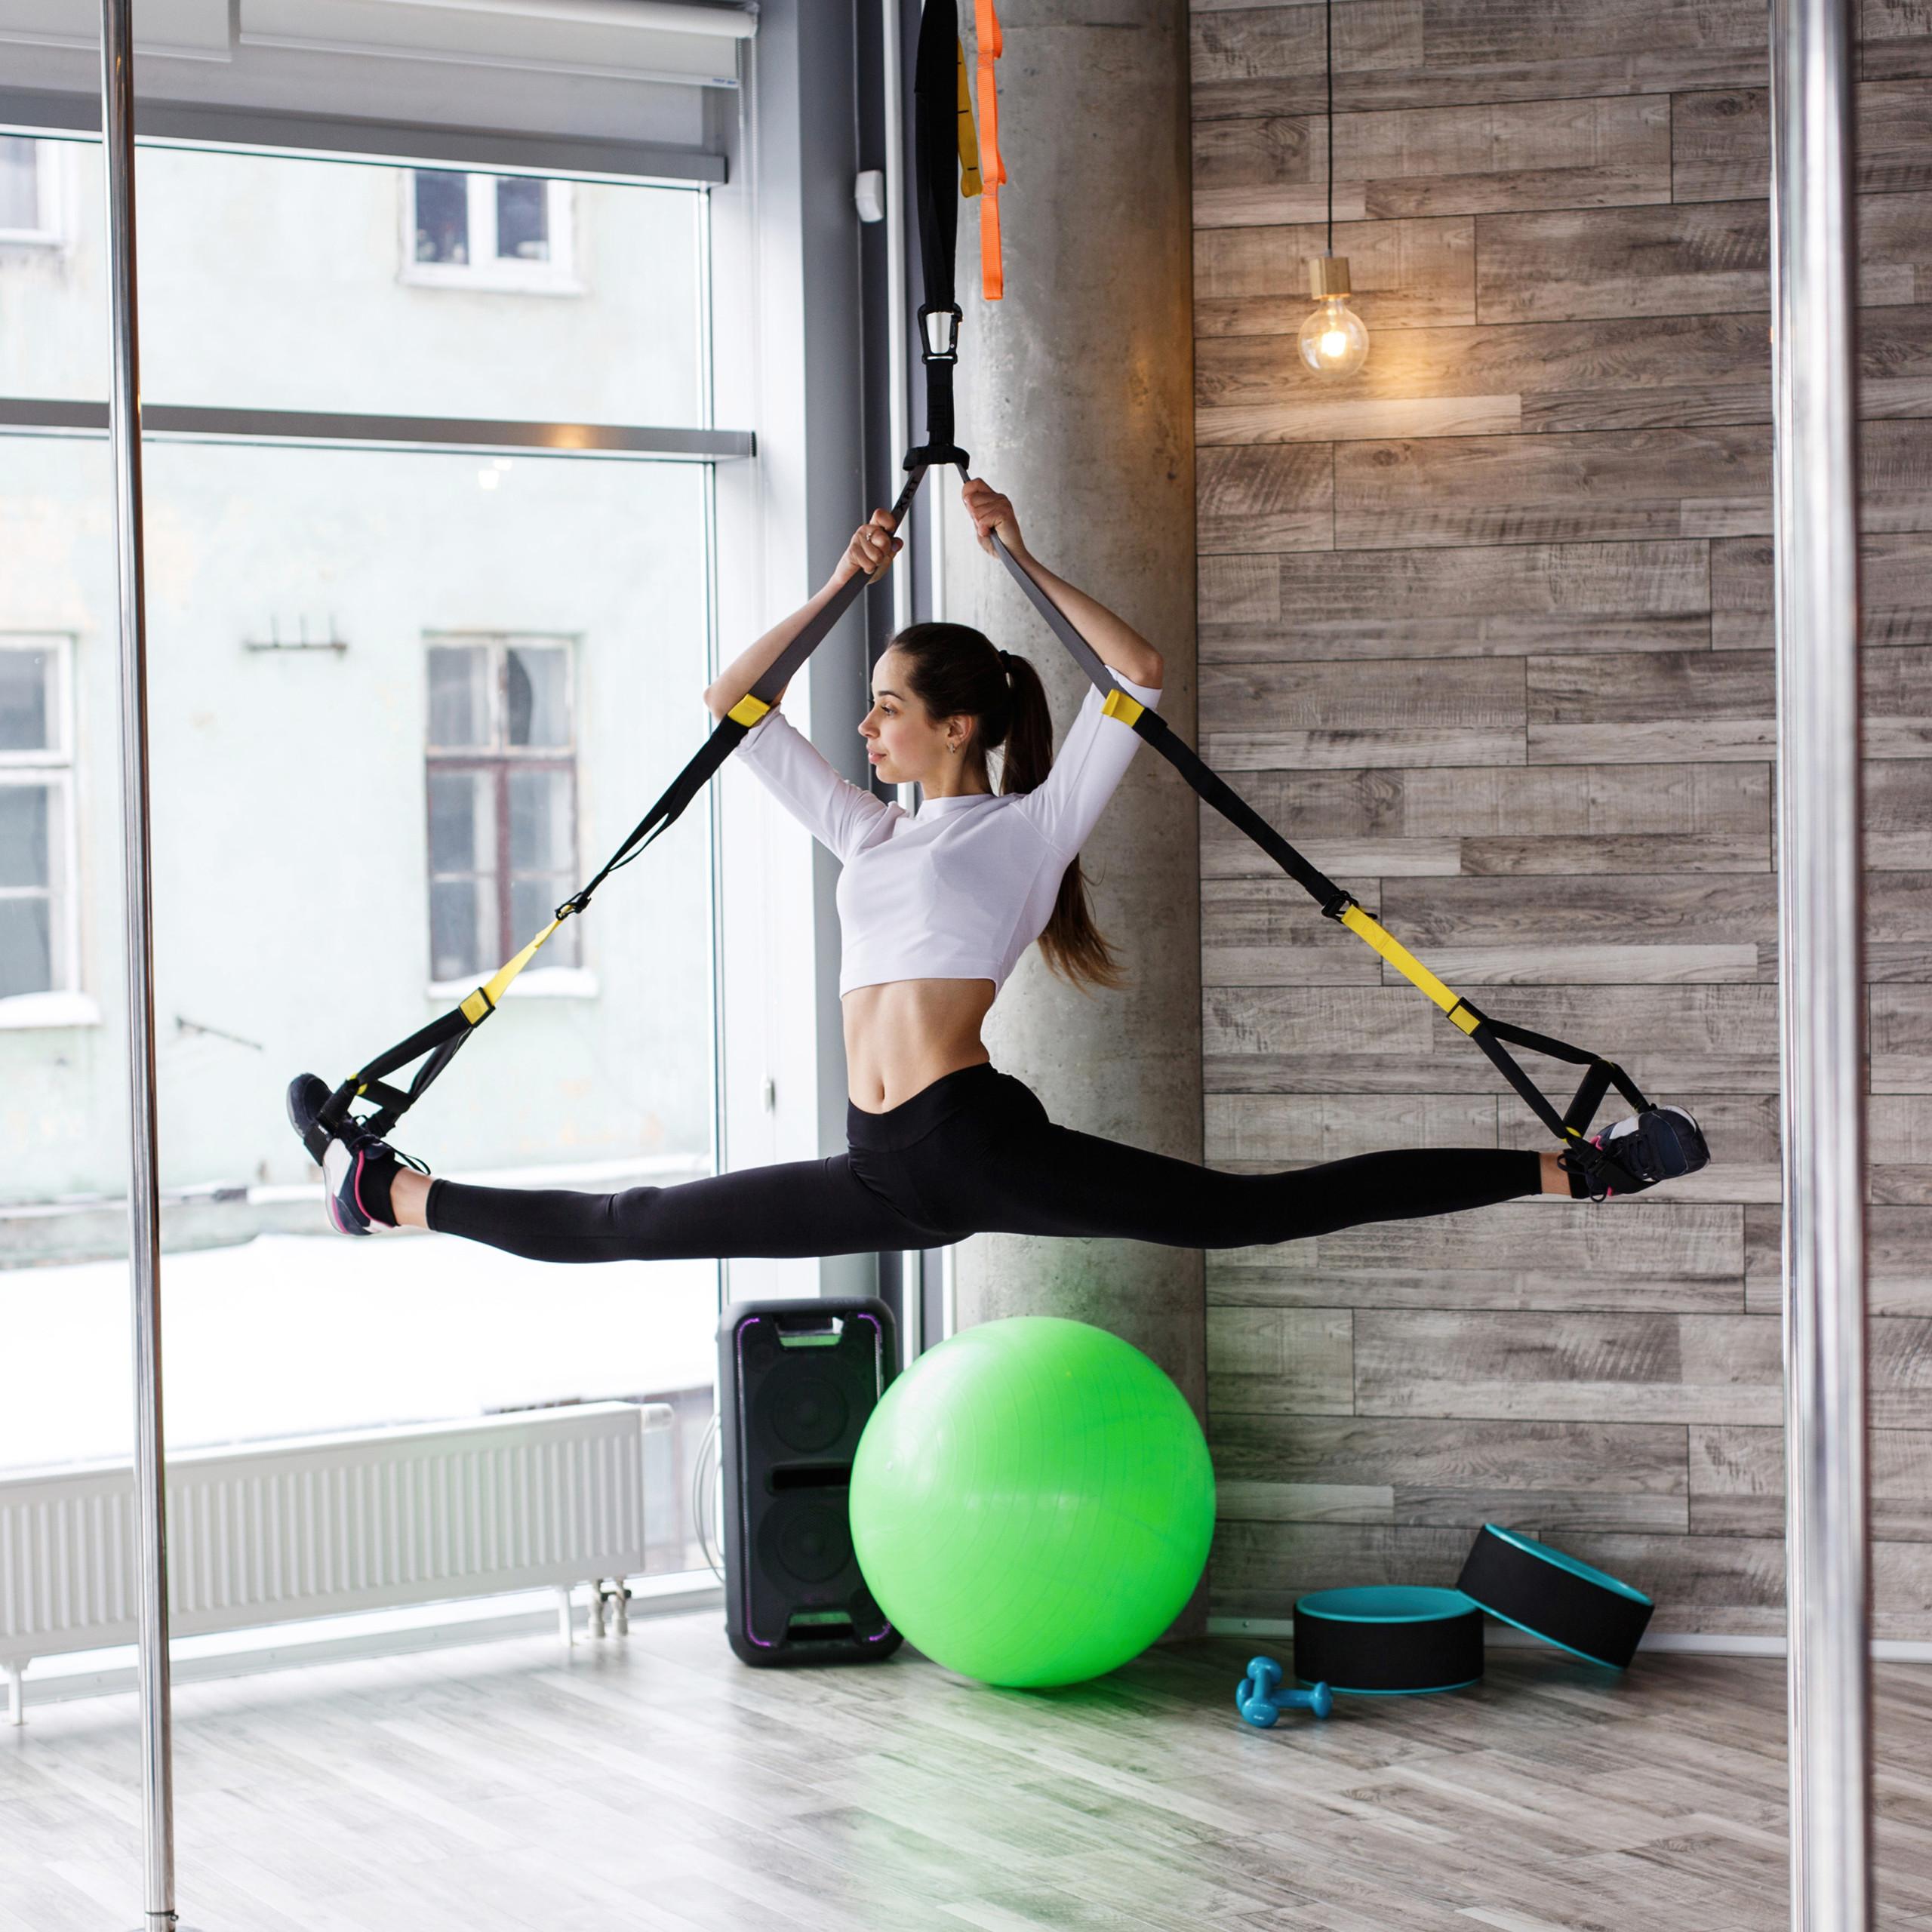 Exercise-Ball-75-cm-PVC-Yoga-Ball-Office-Seat-Gym-Ball-Pilates thumbnail 25